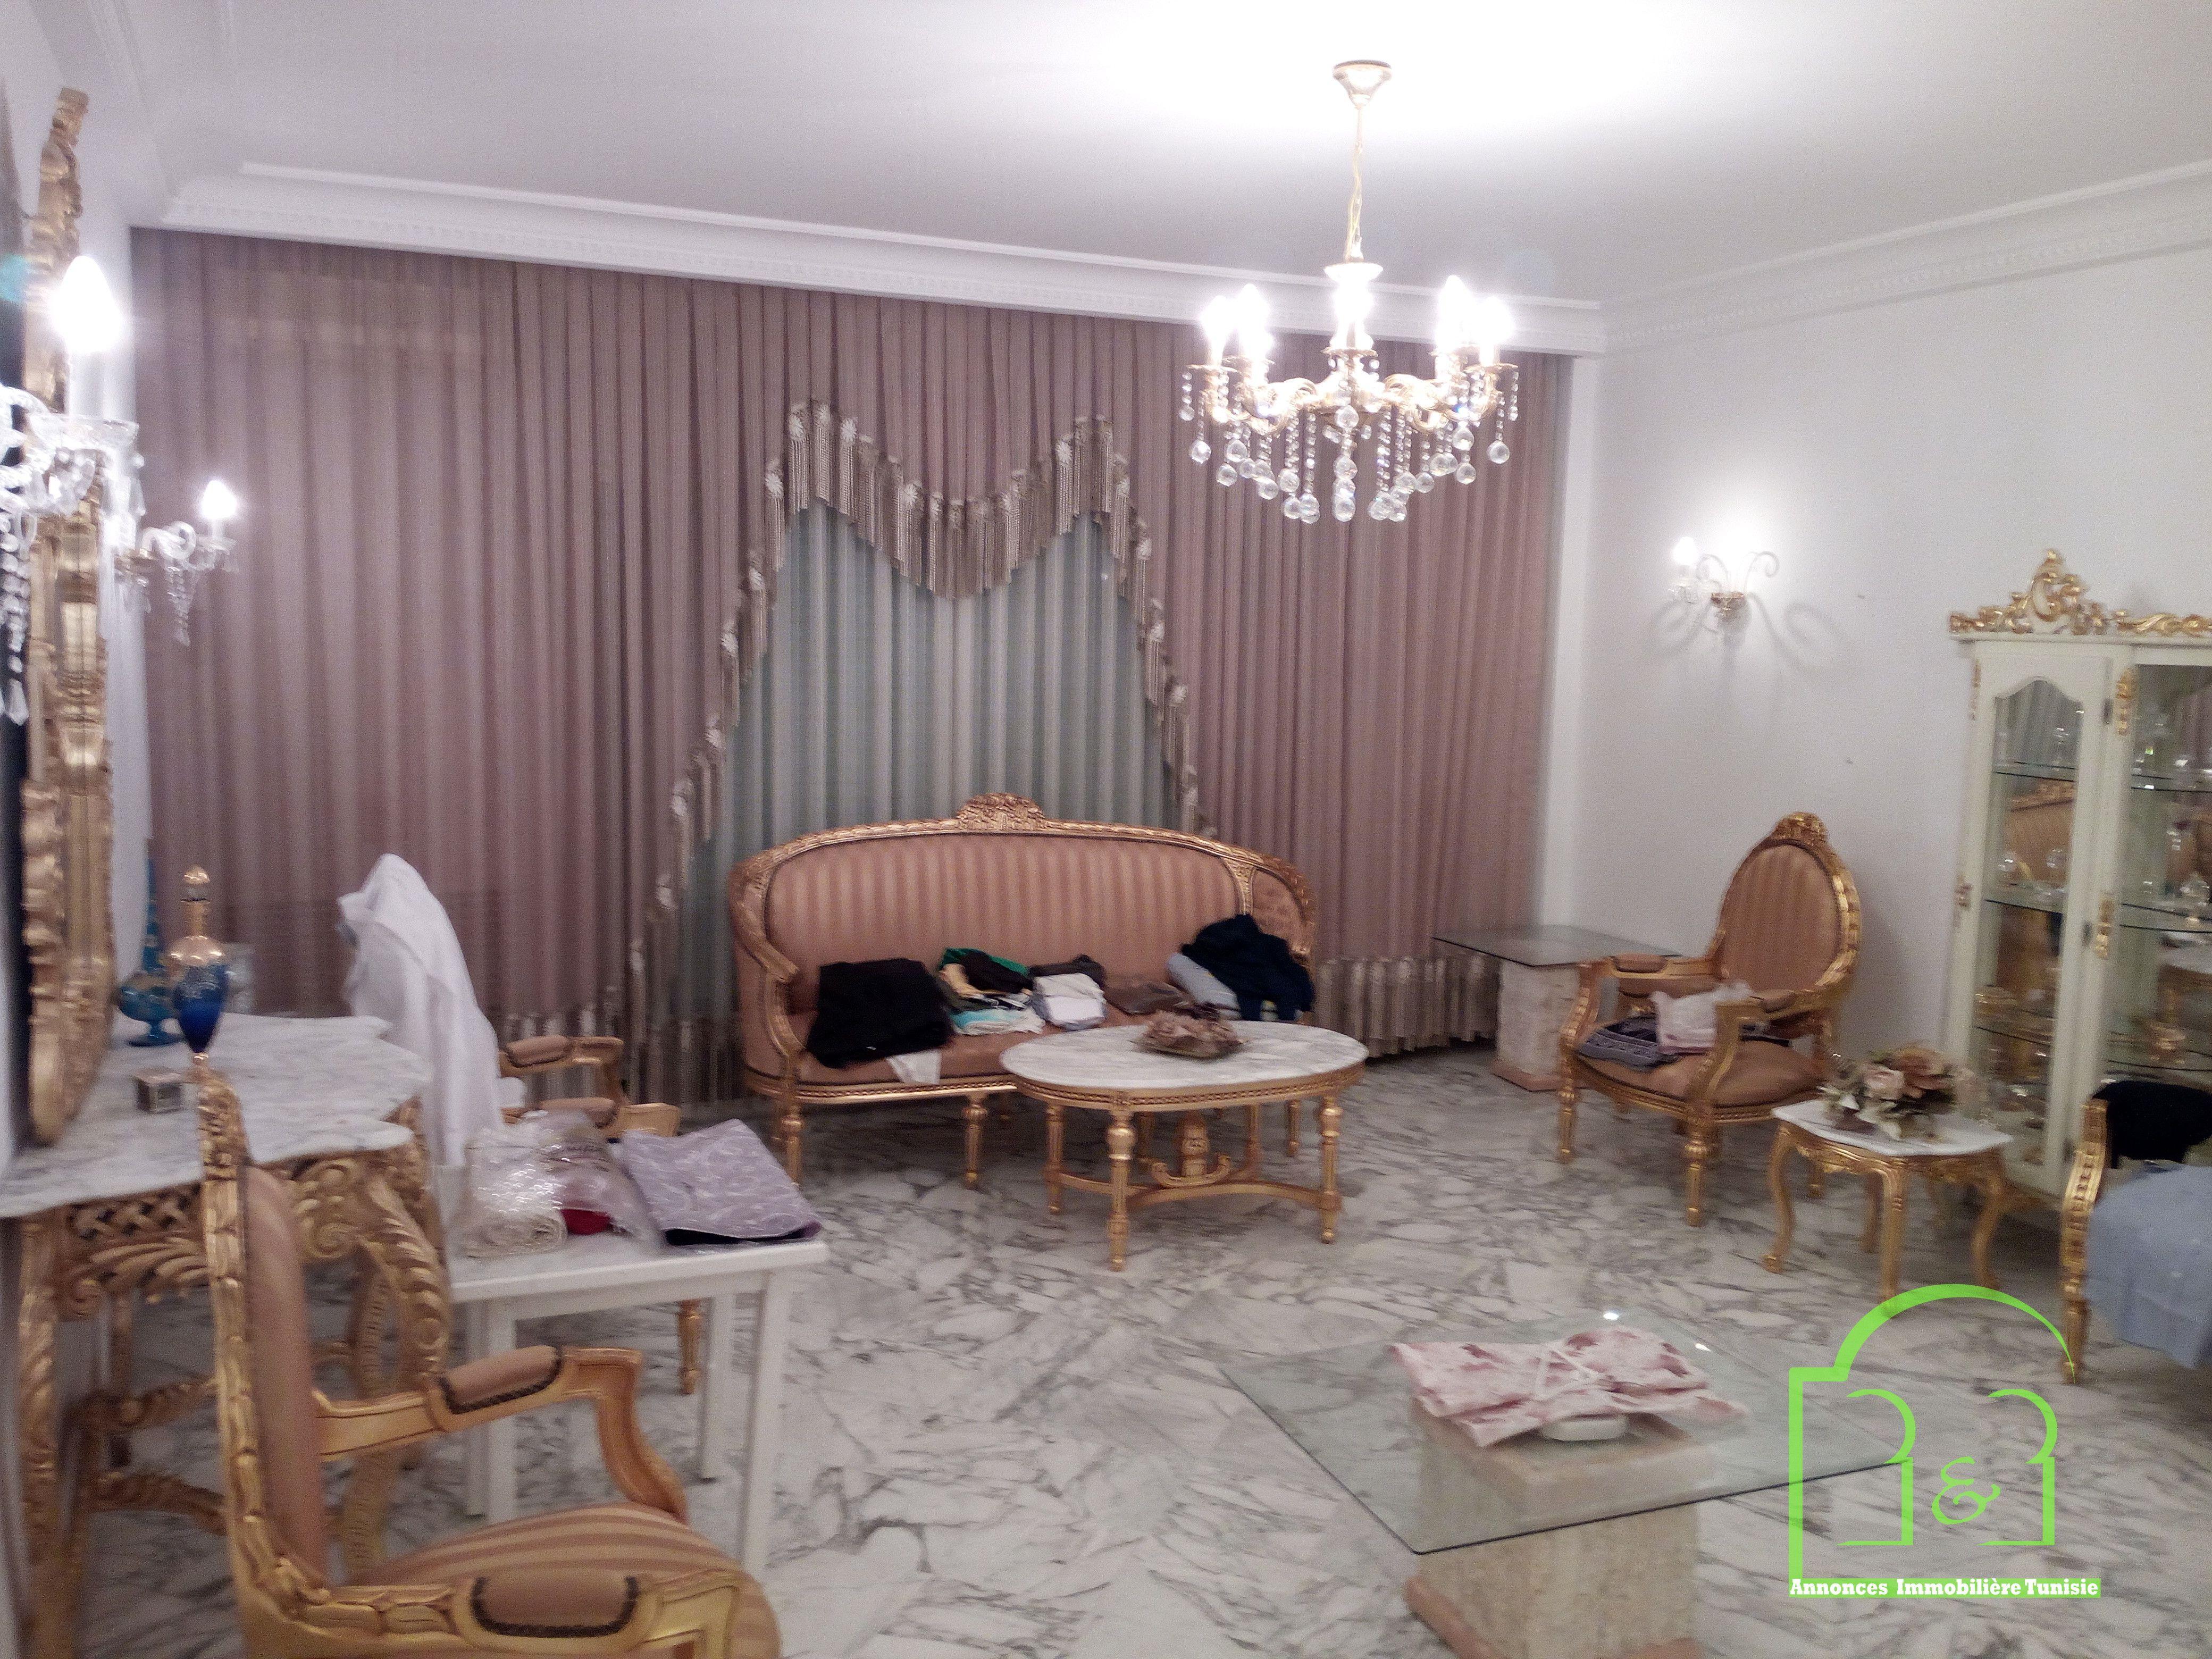 À Louer à Ariana Appart S3 Menzeh 7 Bis Bnb Tunisie Chambre Invite A Louer Deux Chambres